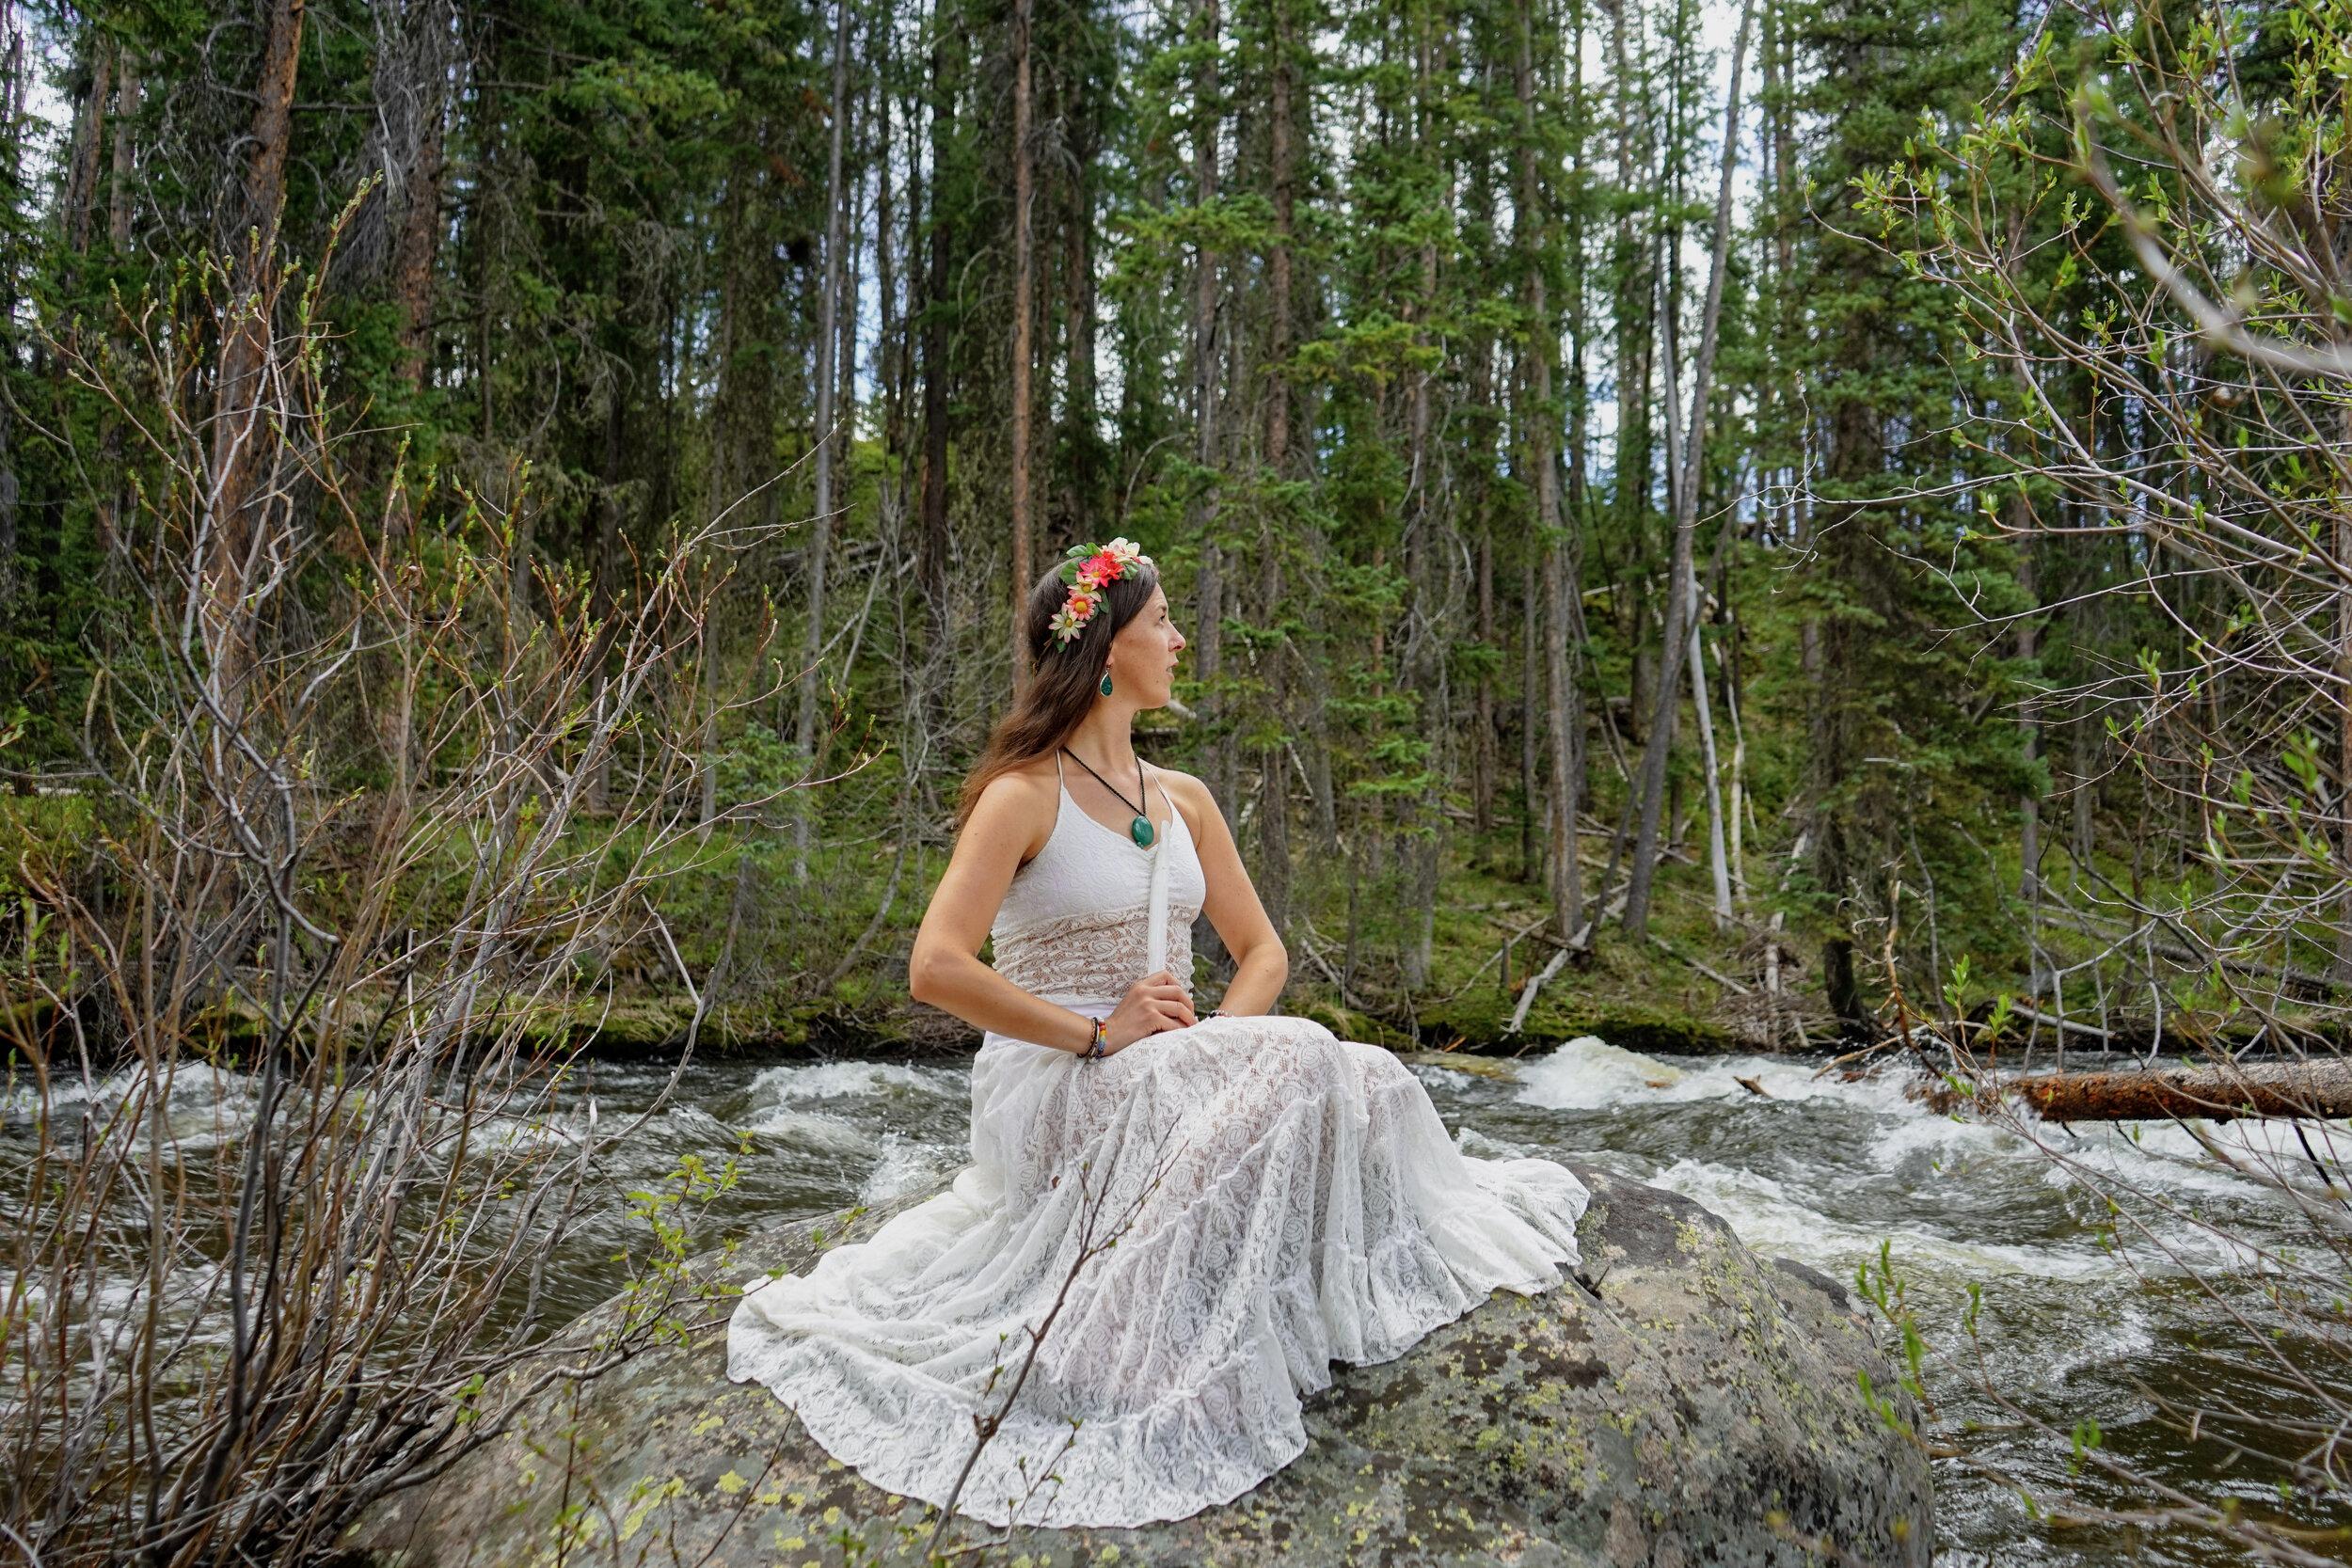 breathwork meditation